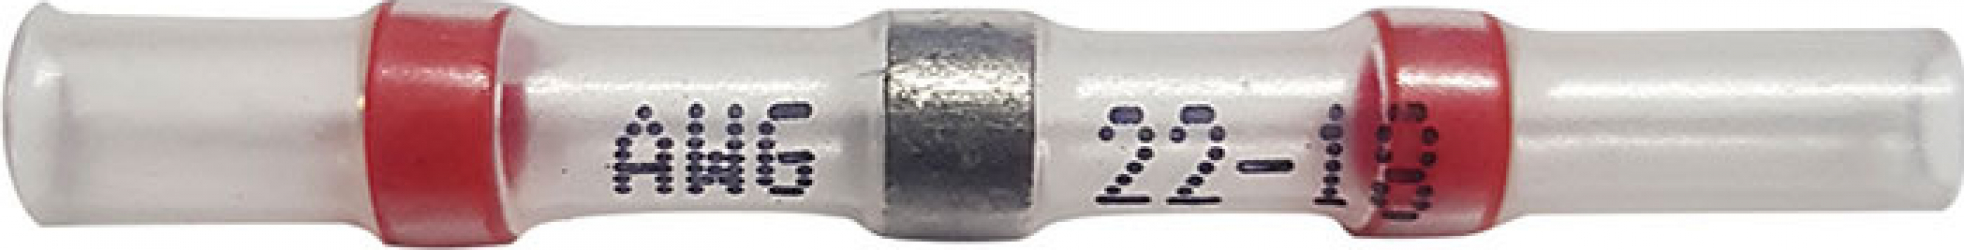 Set 50 bucati Conectori termocontractibili E-LOCKS cu lipire si etansare pentru conductori electrici model ST2R